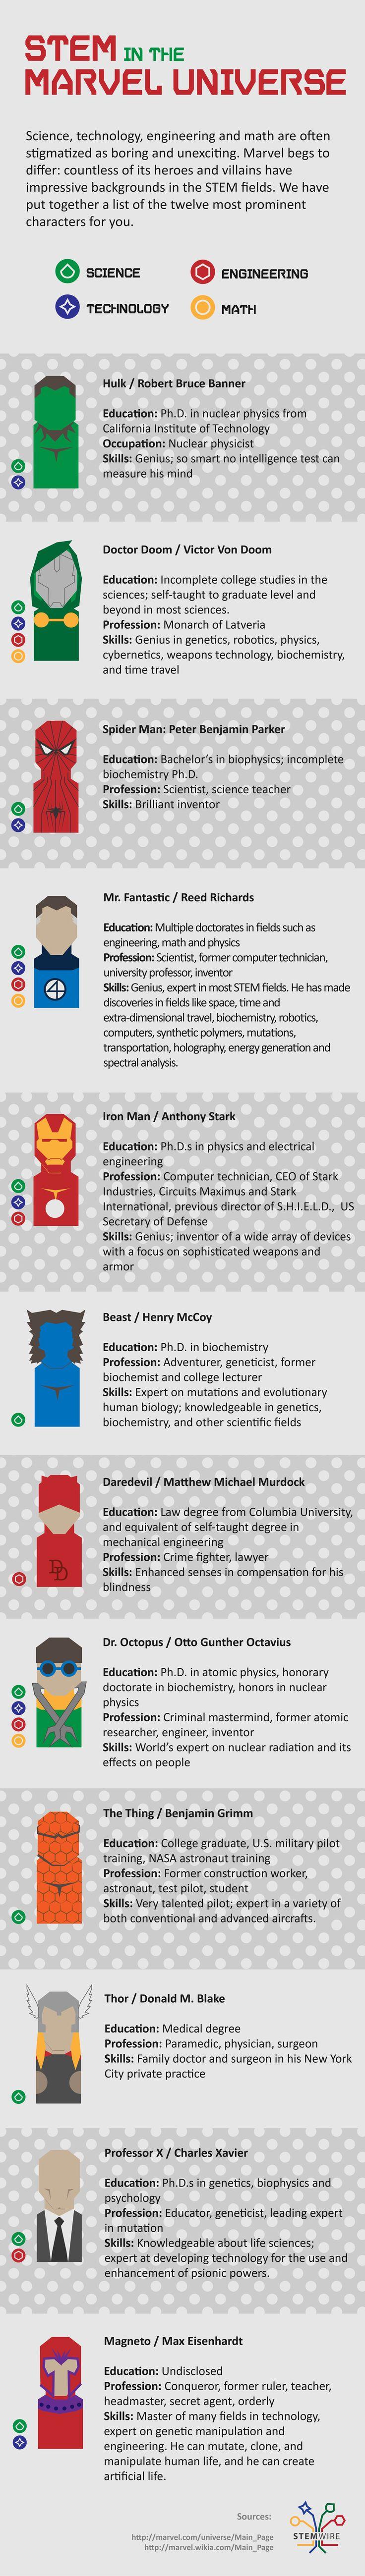 STEM Superheroes Infographic